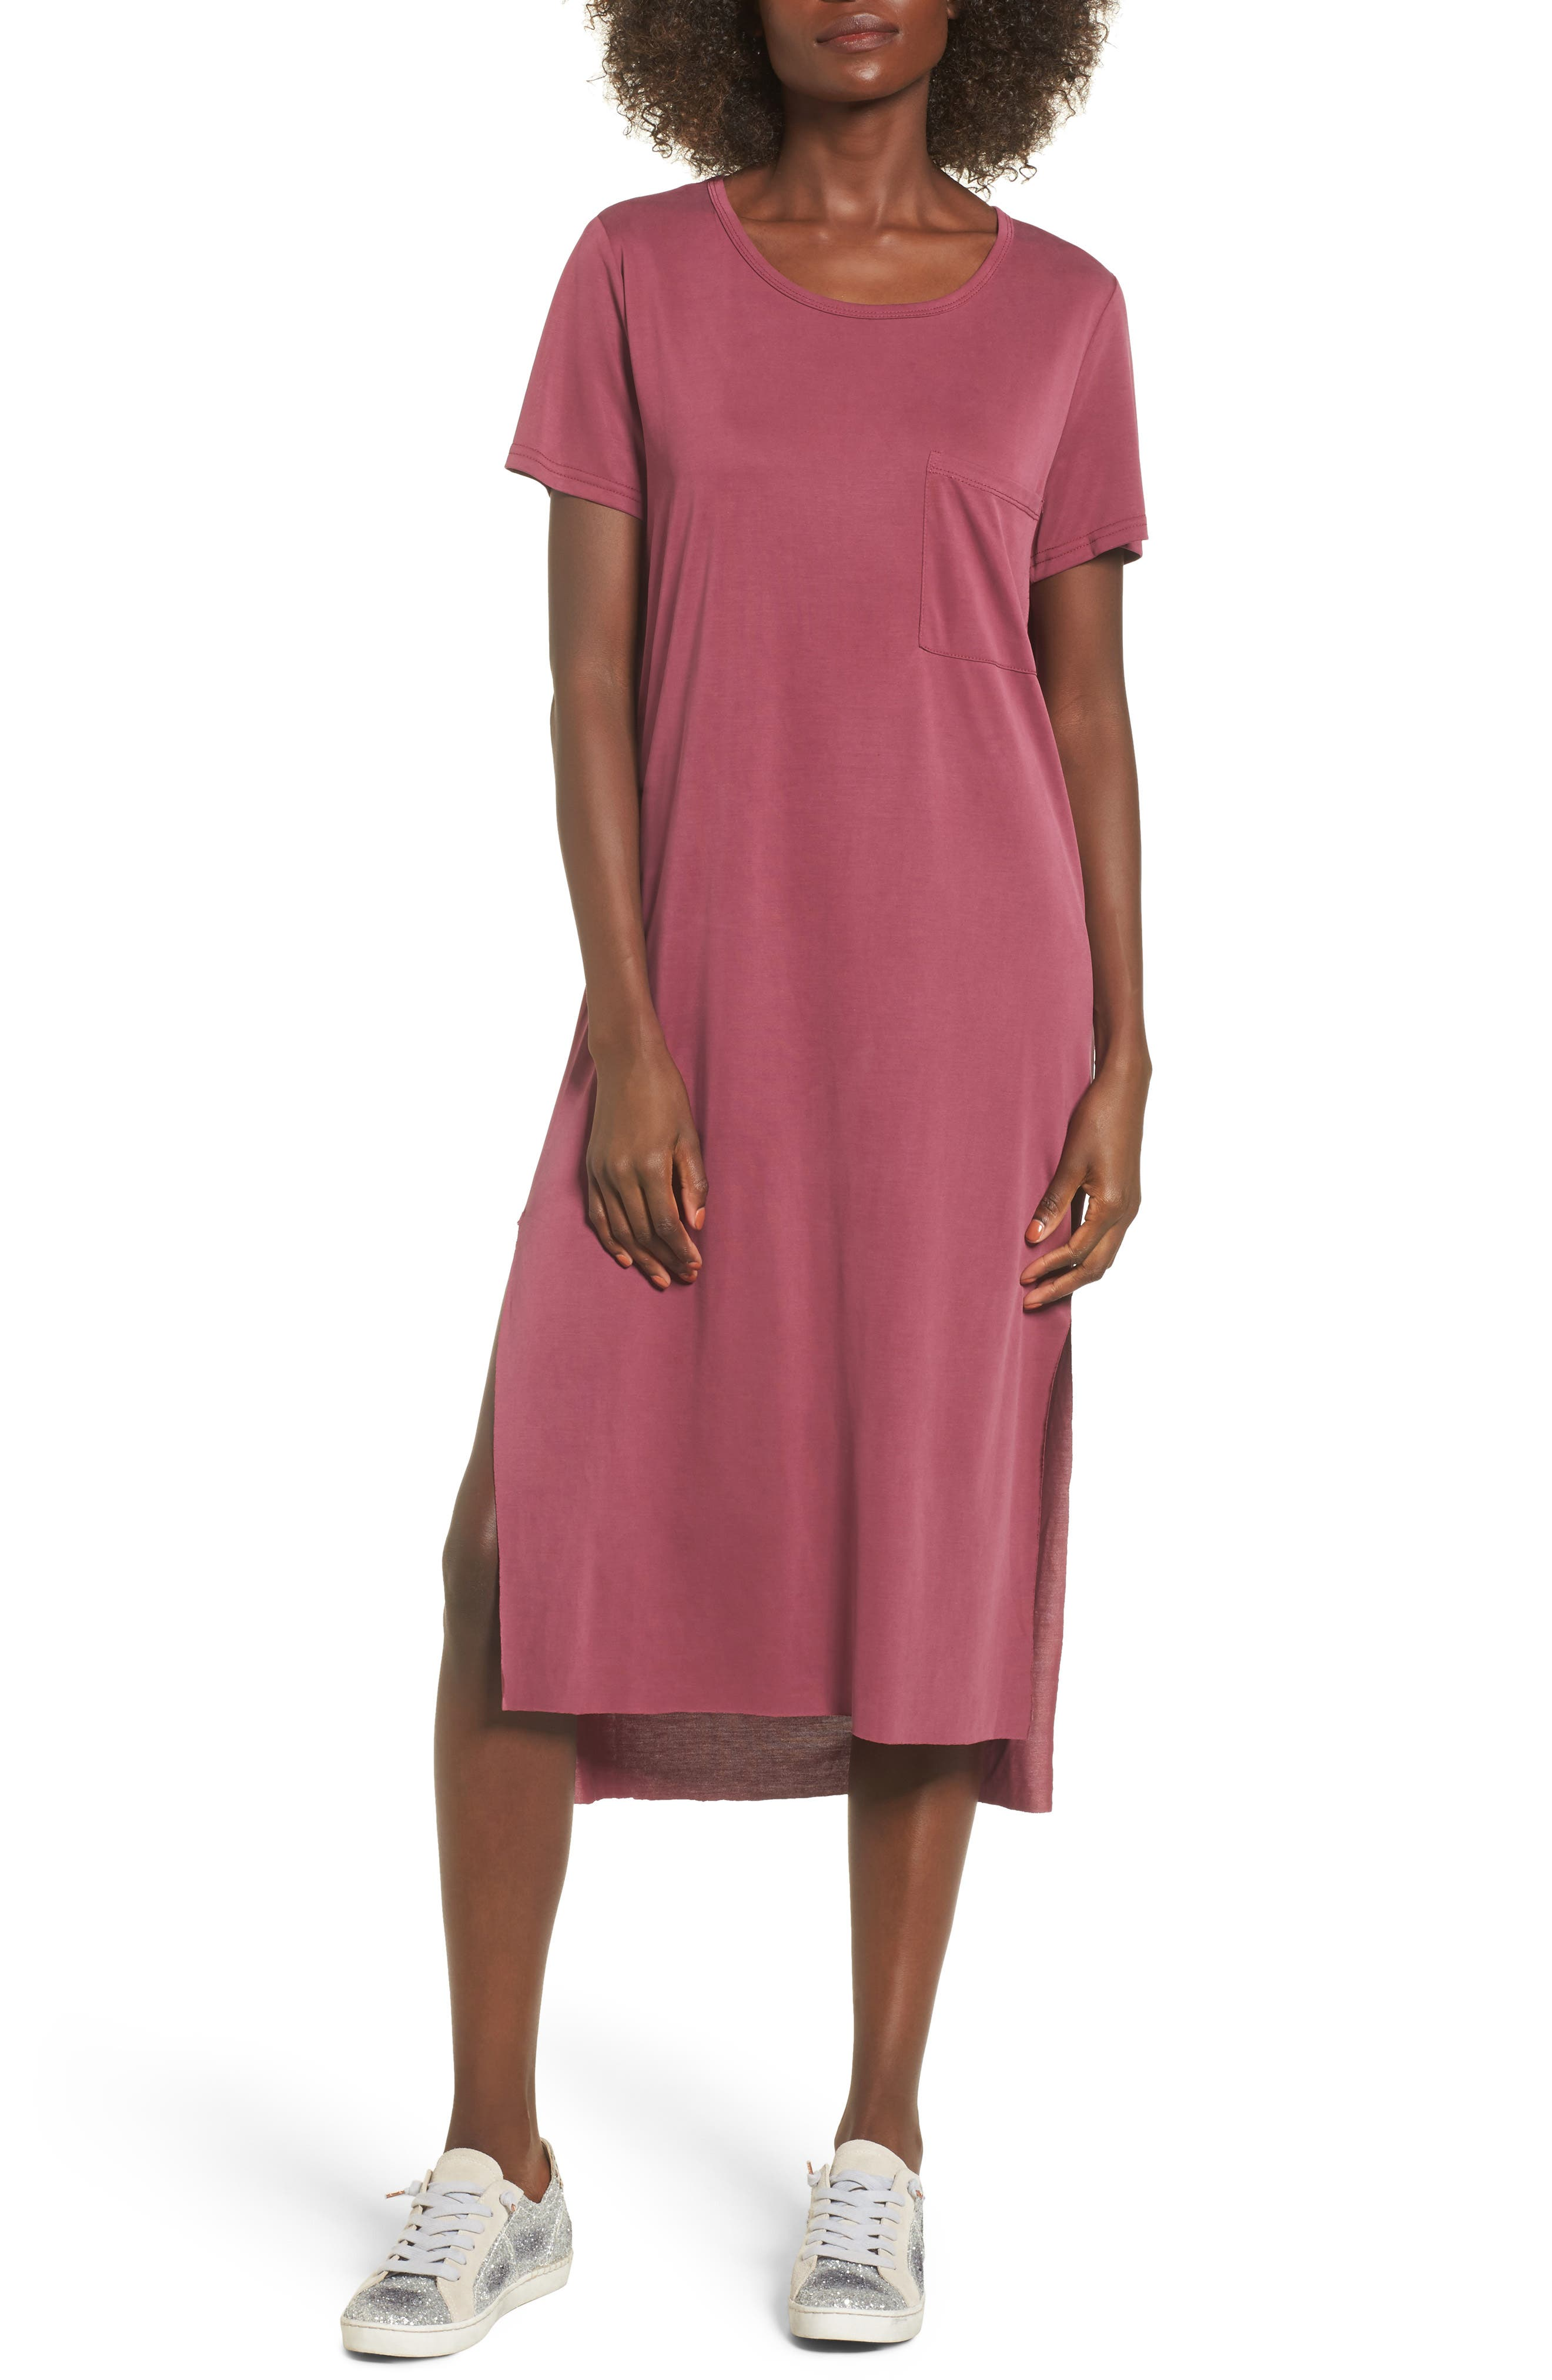 Main Image - Lira Clothing Eden Midi T-Shirt Dress